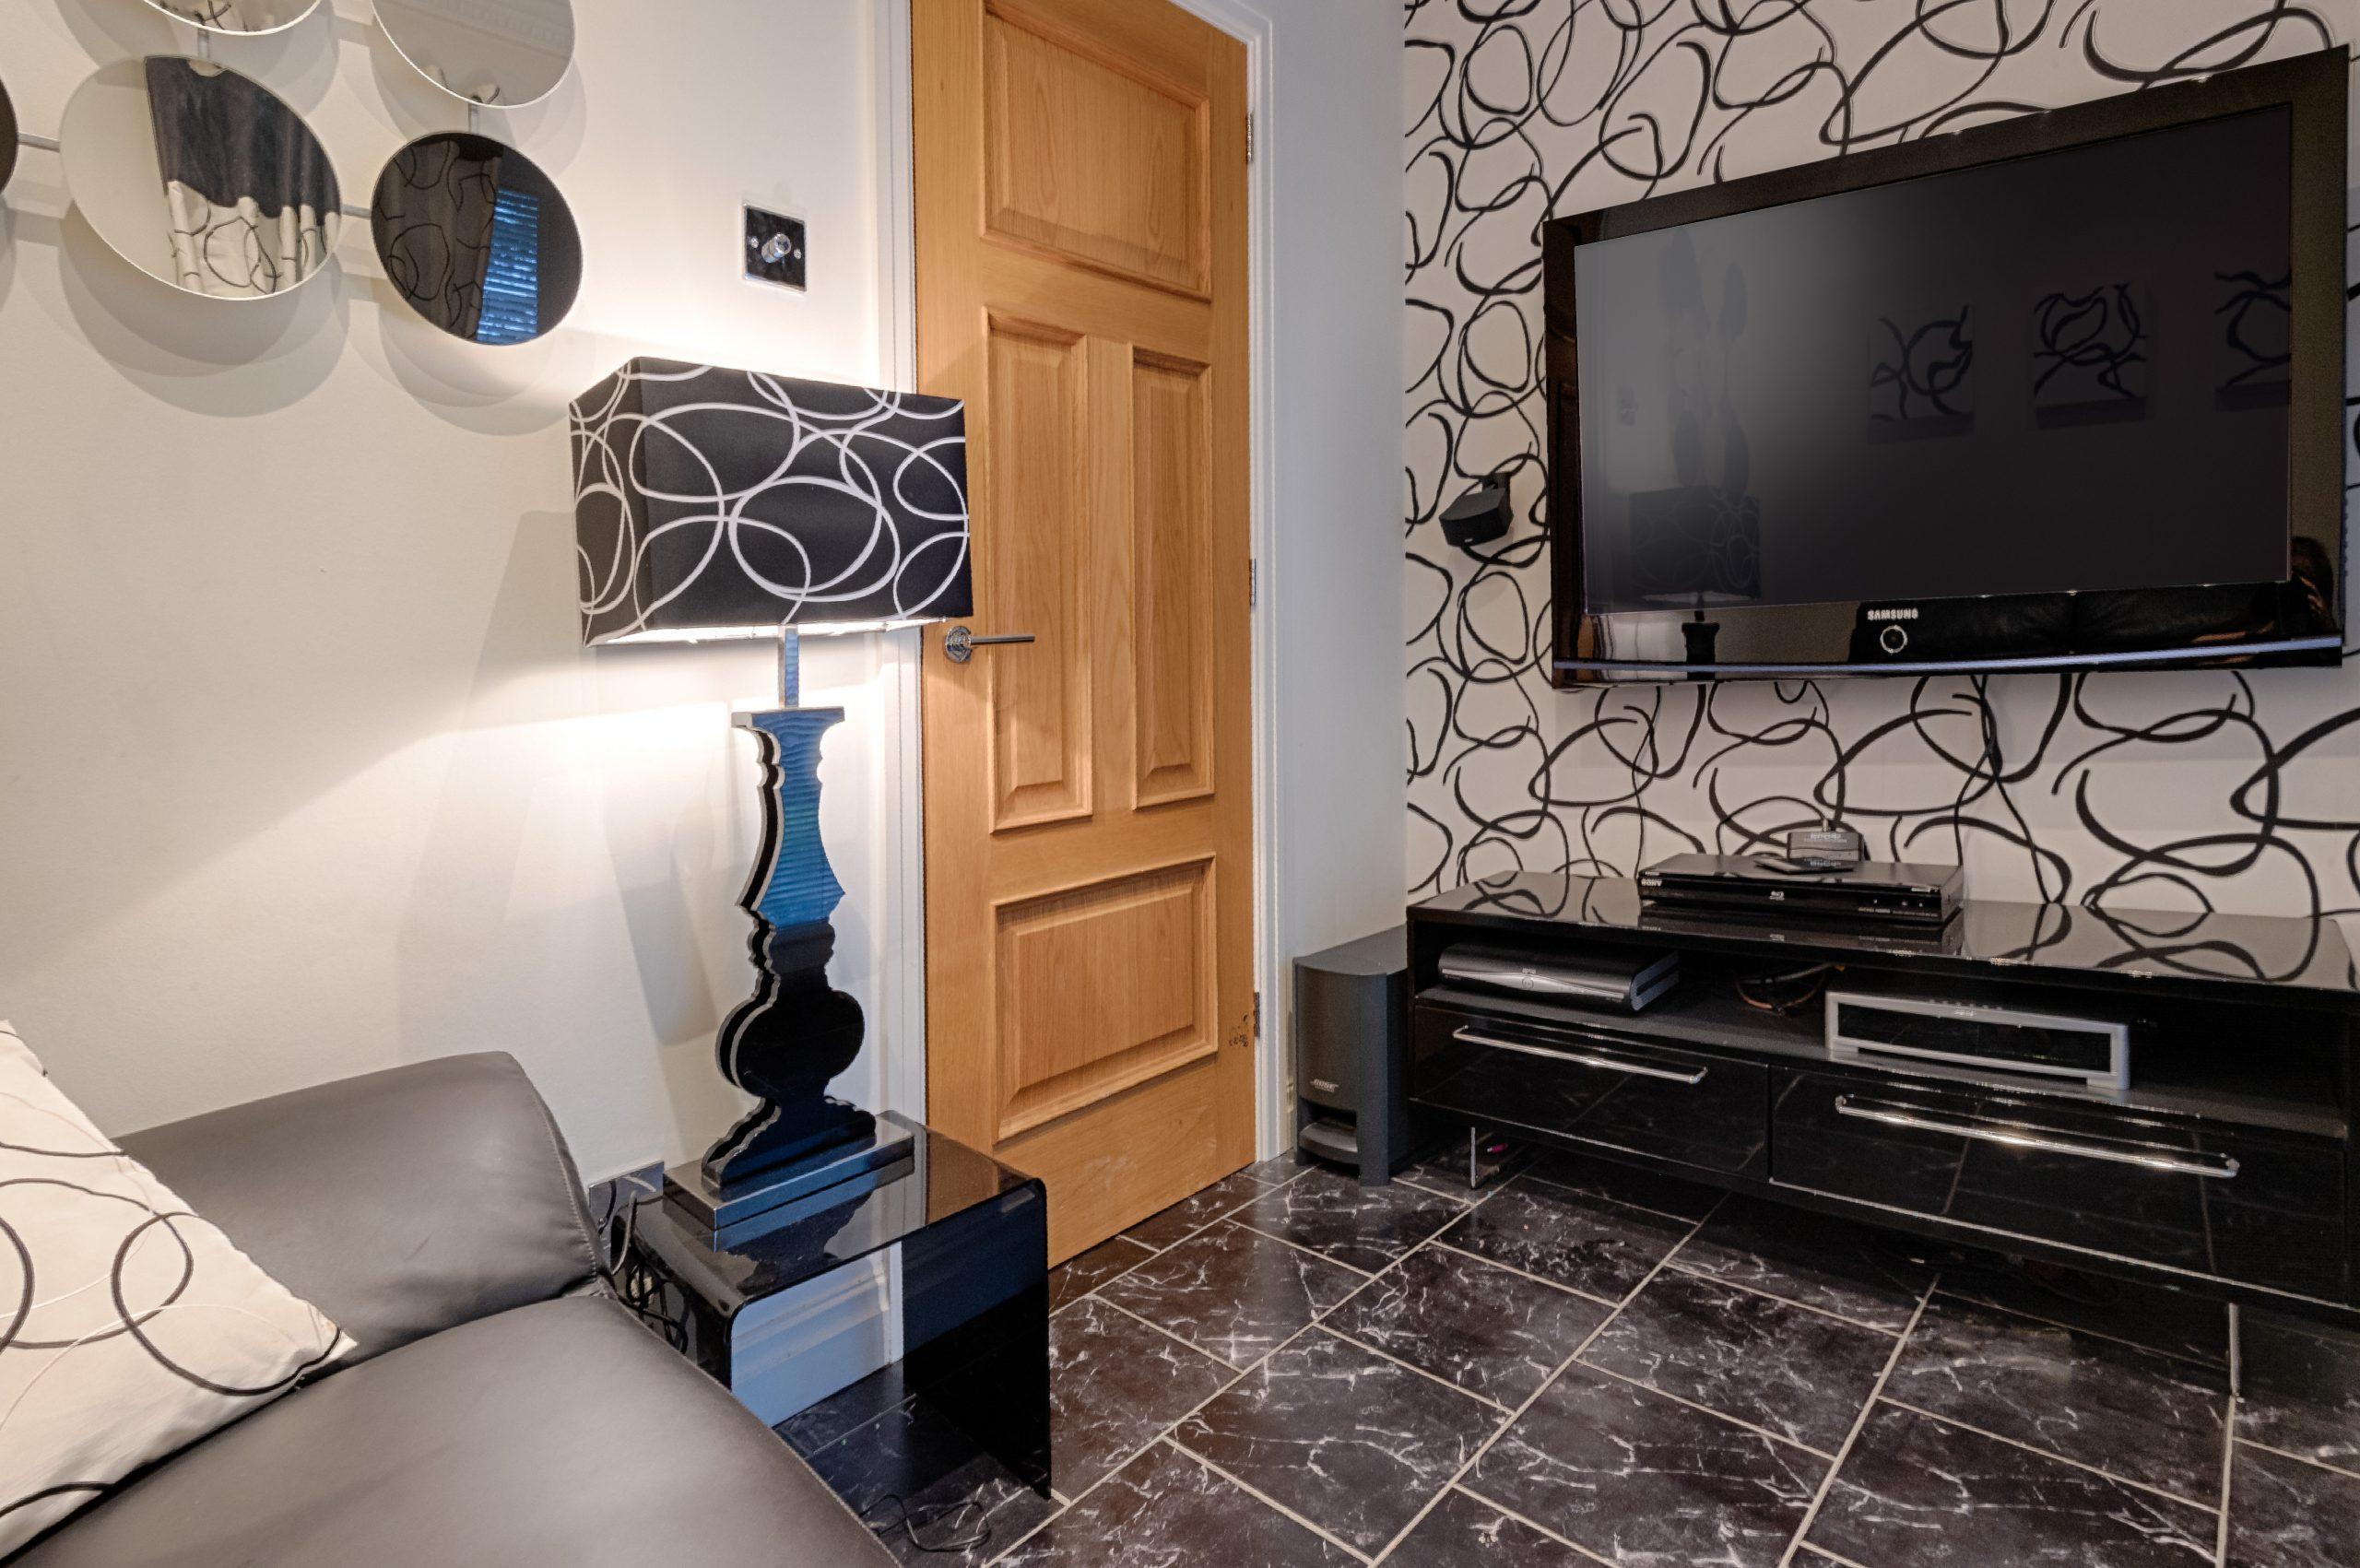 Bedroom 5 or TV Room